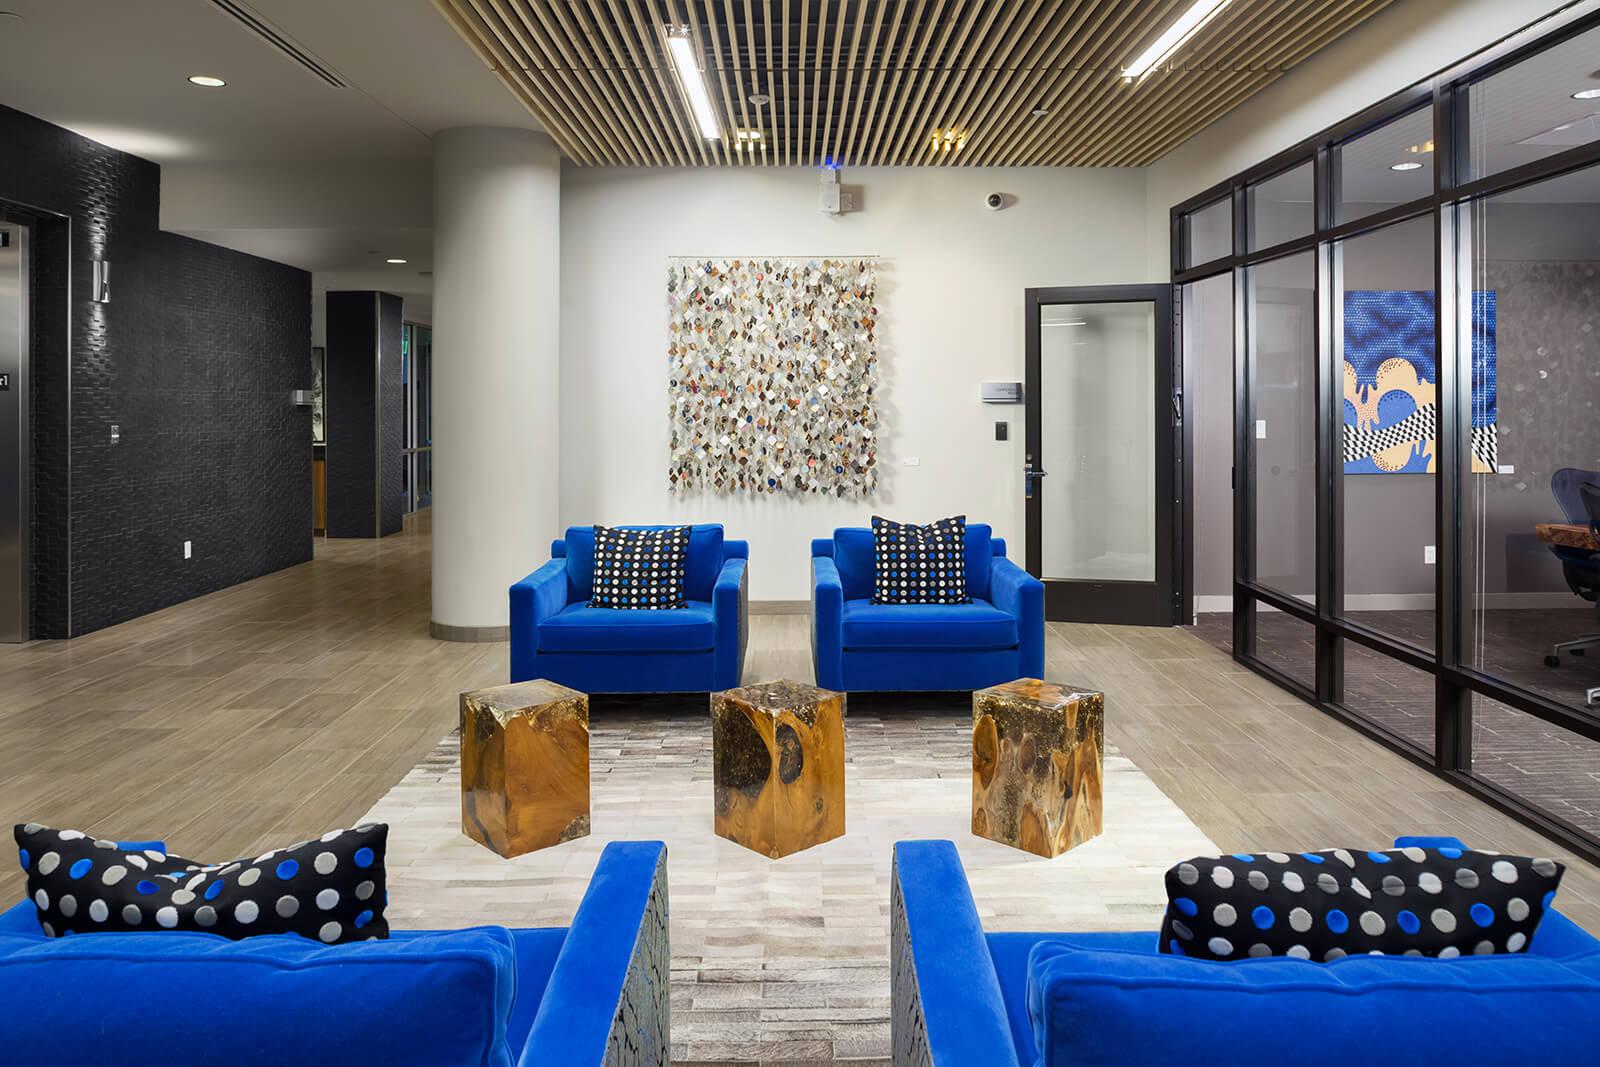 Leasing Office at 1000 Speer by Windsor, Denver, Colorado